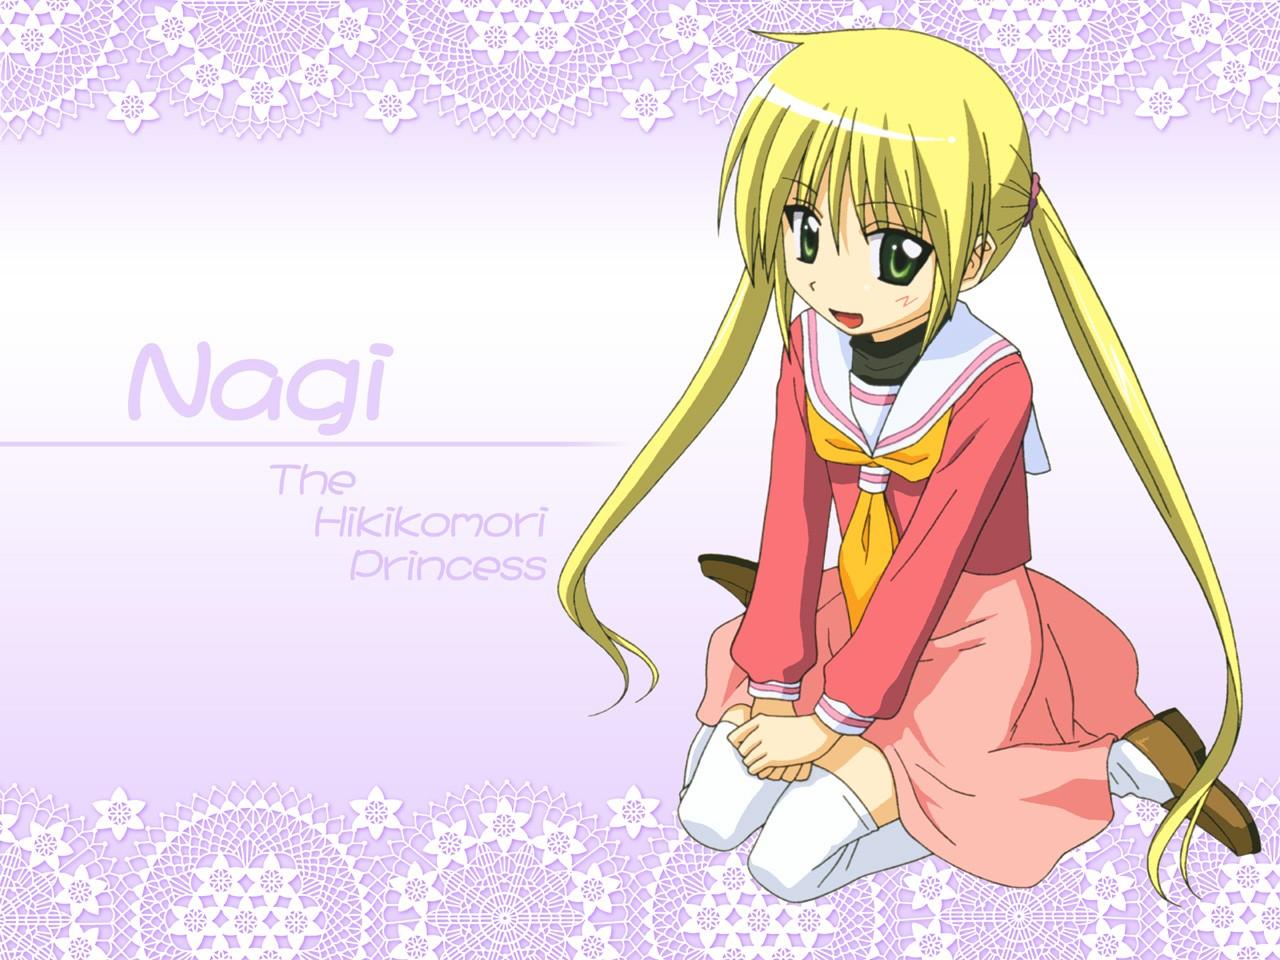 blonde_hair green_eyes hayate_no_gotoku long_hair sanzenin_nagi school_uniform skirt thighhighs twintails